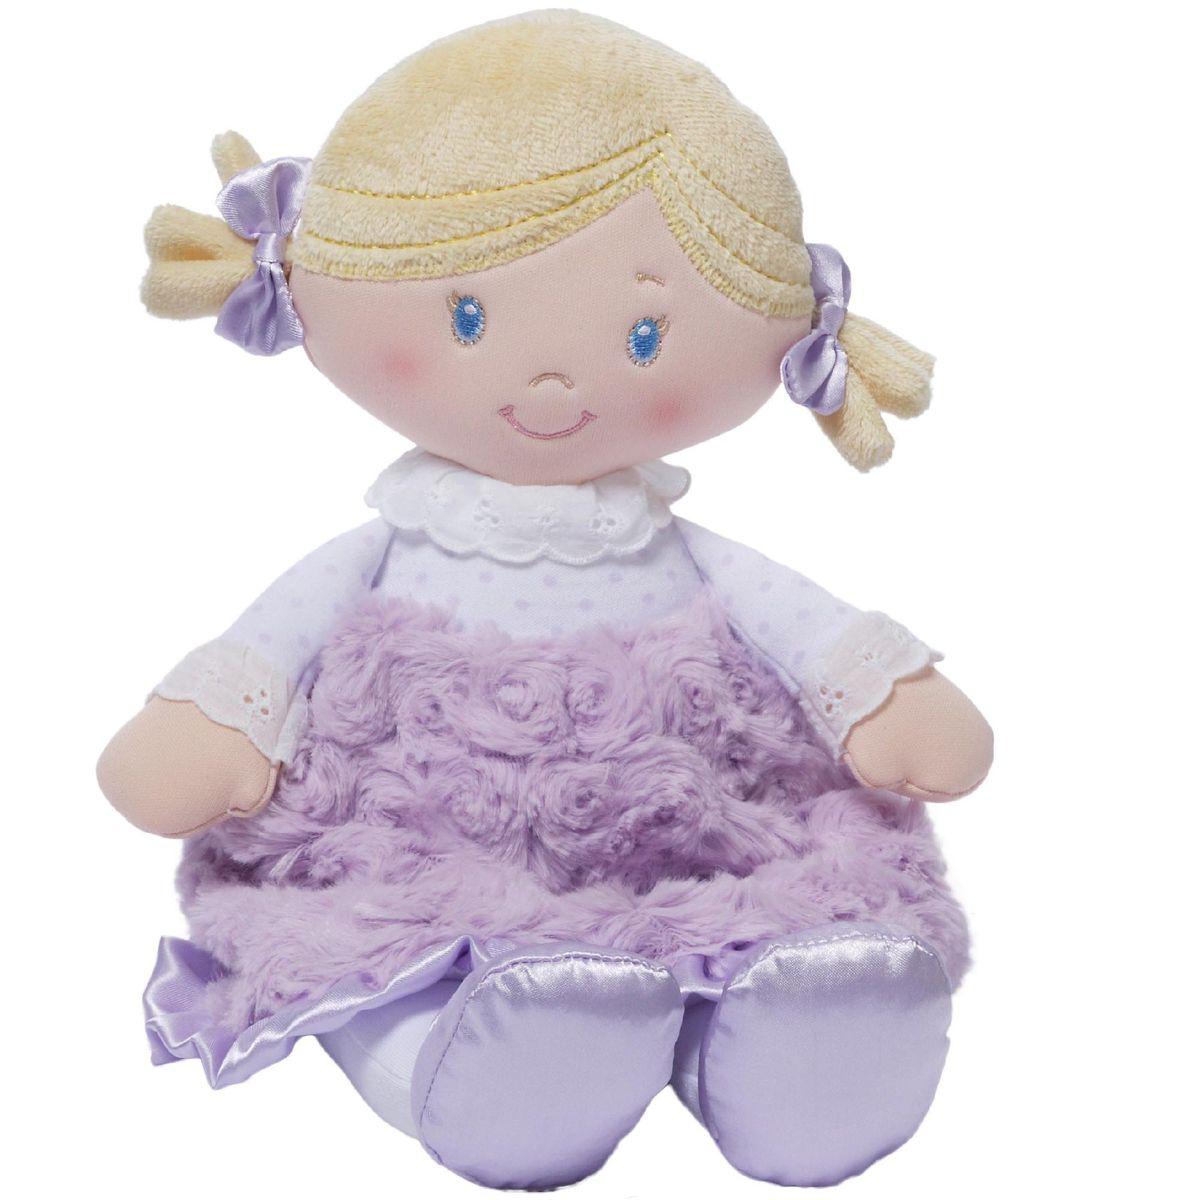 Gund Мягкая кукла Cece Doll мягкая игрушка gund doll berry sweet dolly 10 blonde doll